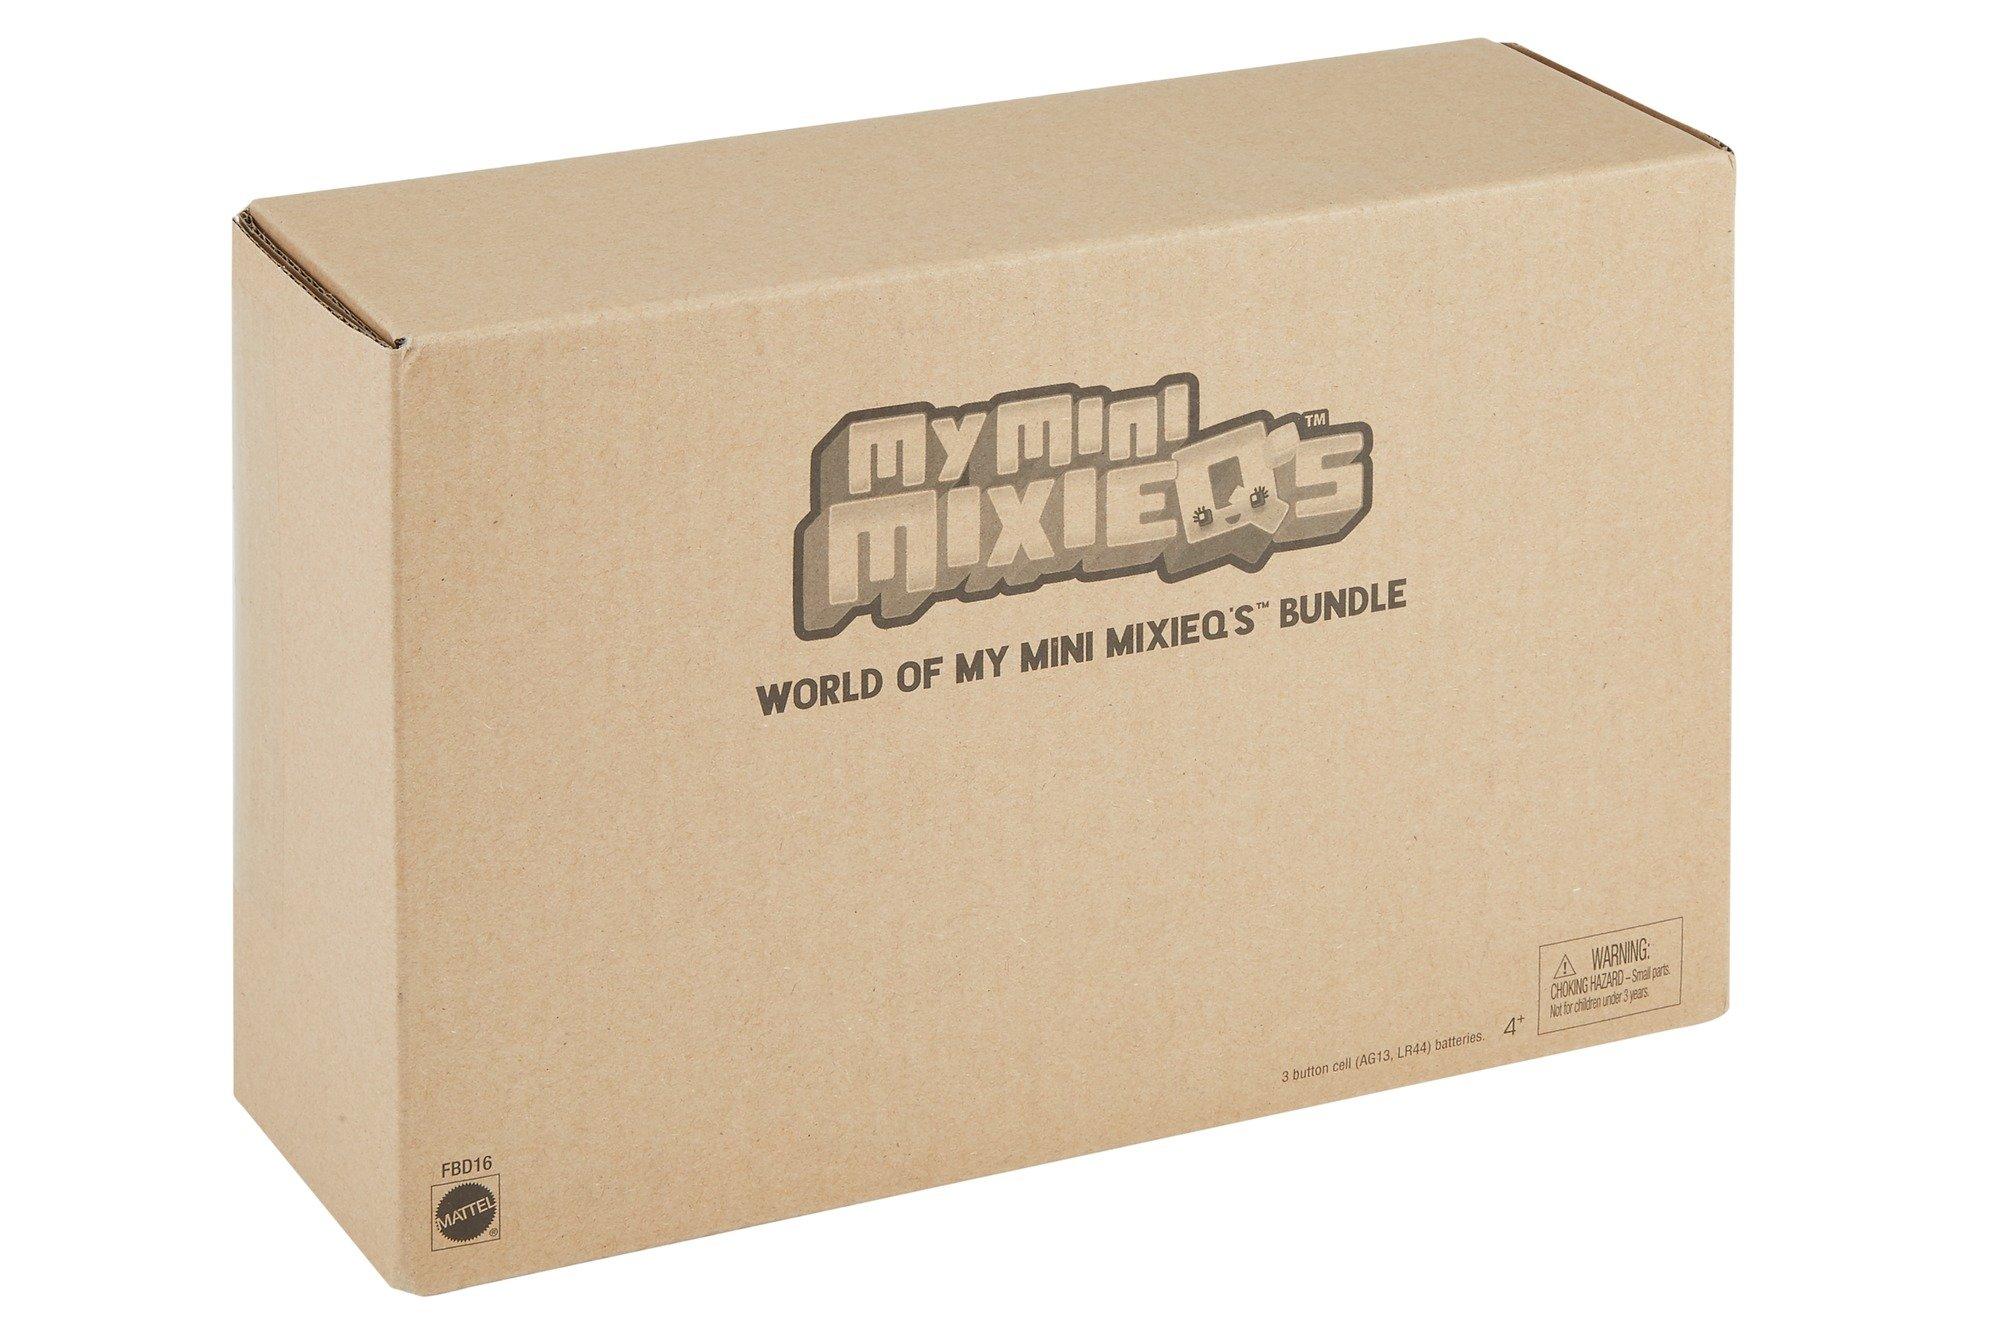 My Mini MixieQ's Bundle - Mini Rooms, Playsets, and Figures by My Mini MixieQ's (Image #9)